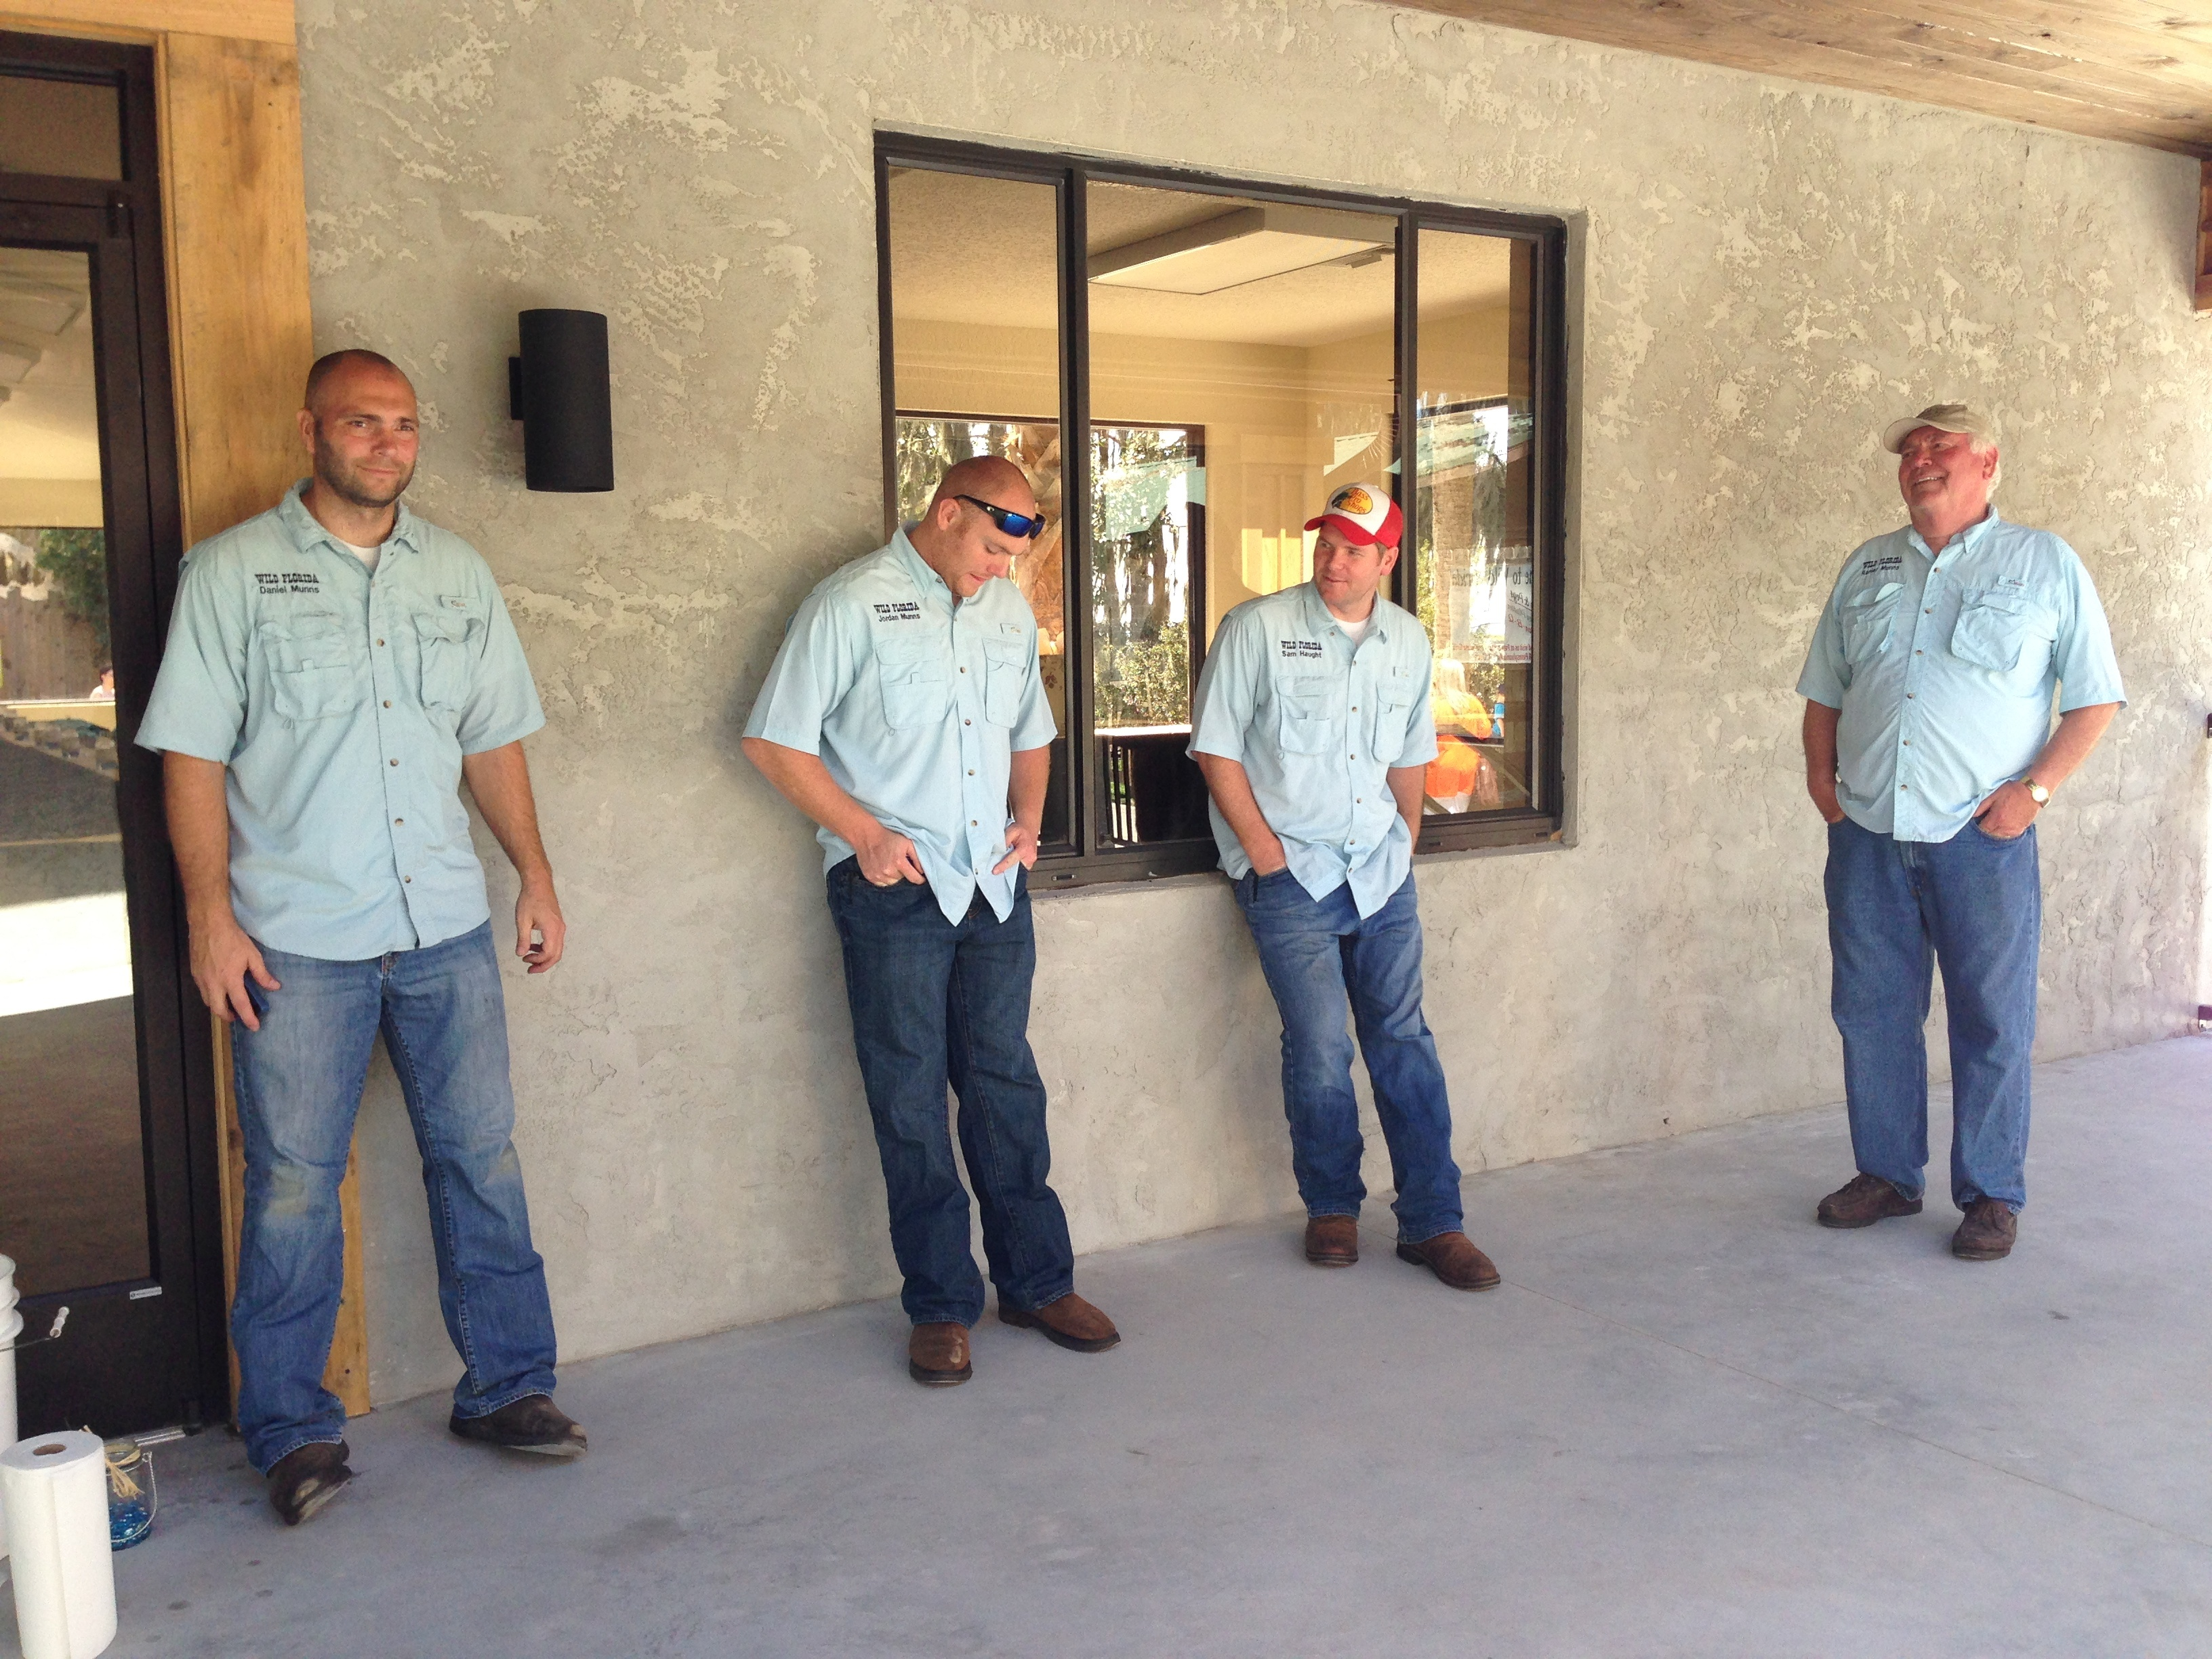 Munns Men hanging out at Wild Florida's Wildlife Park